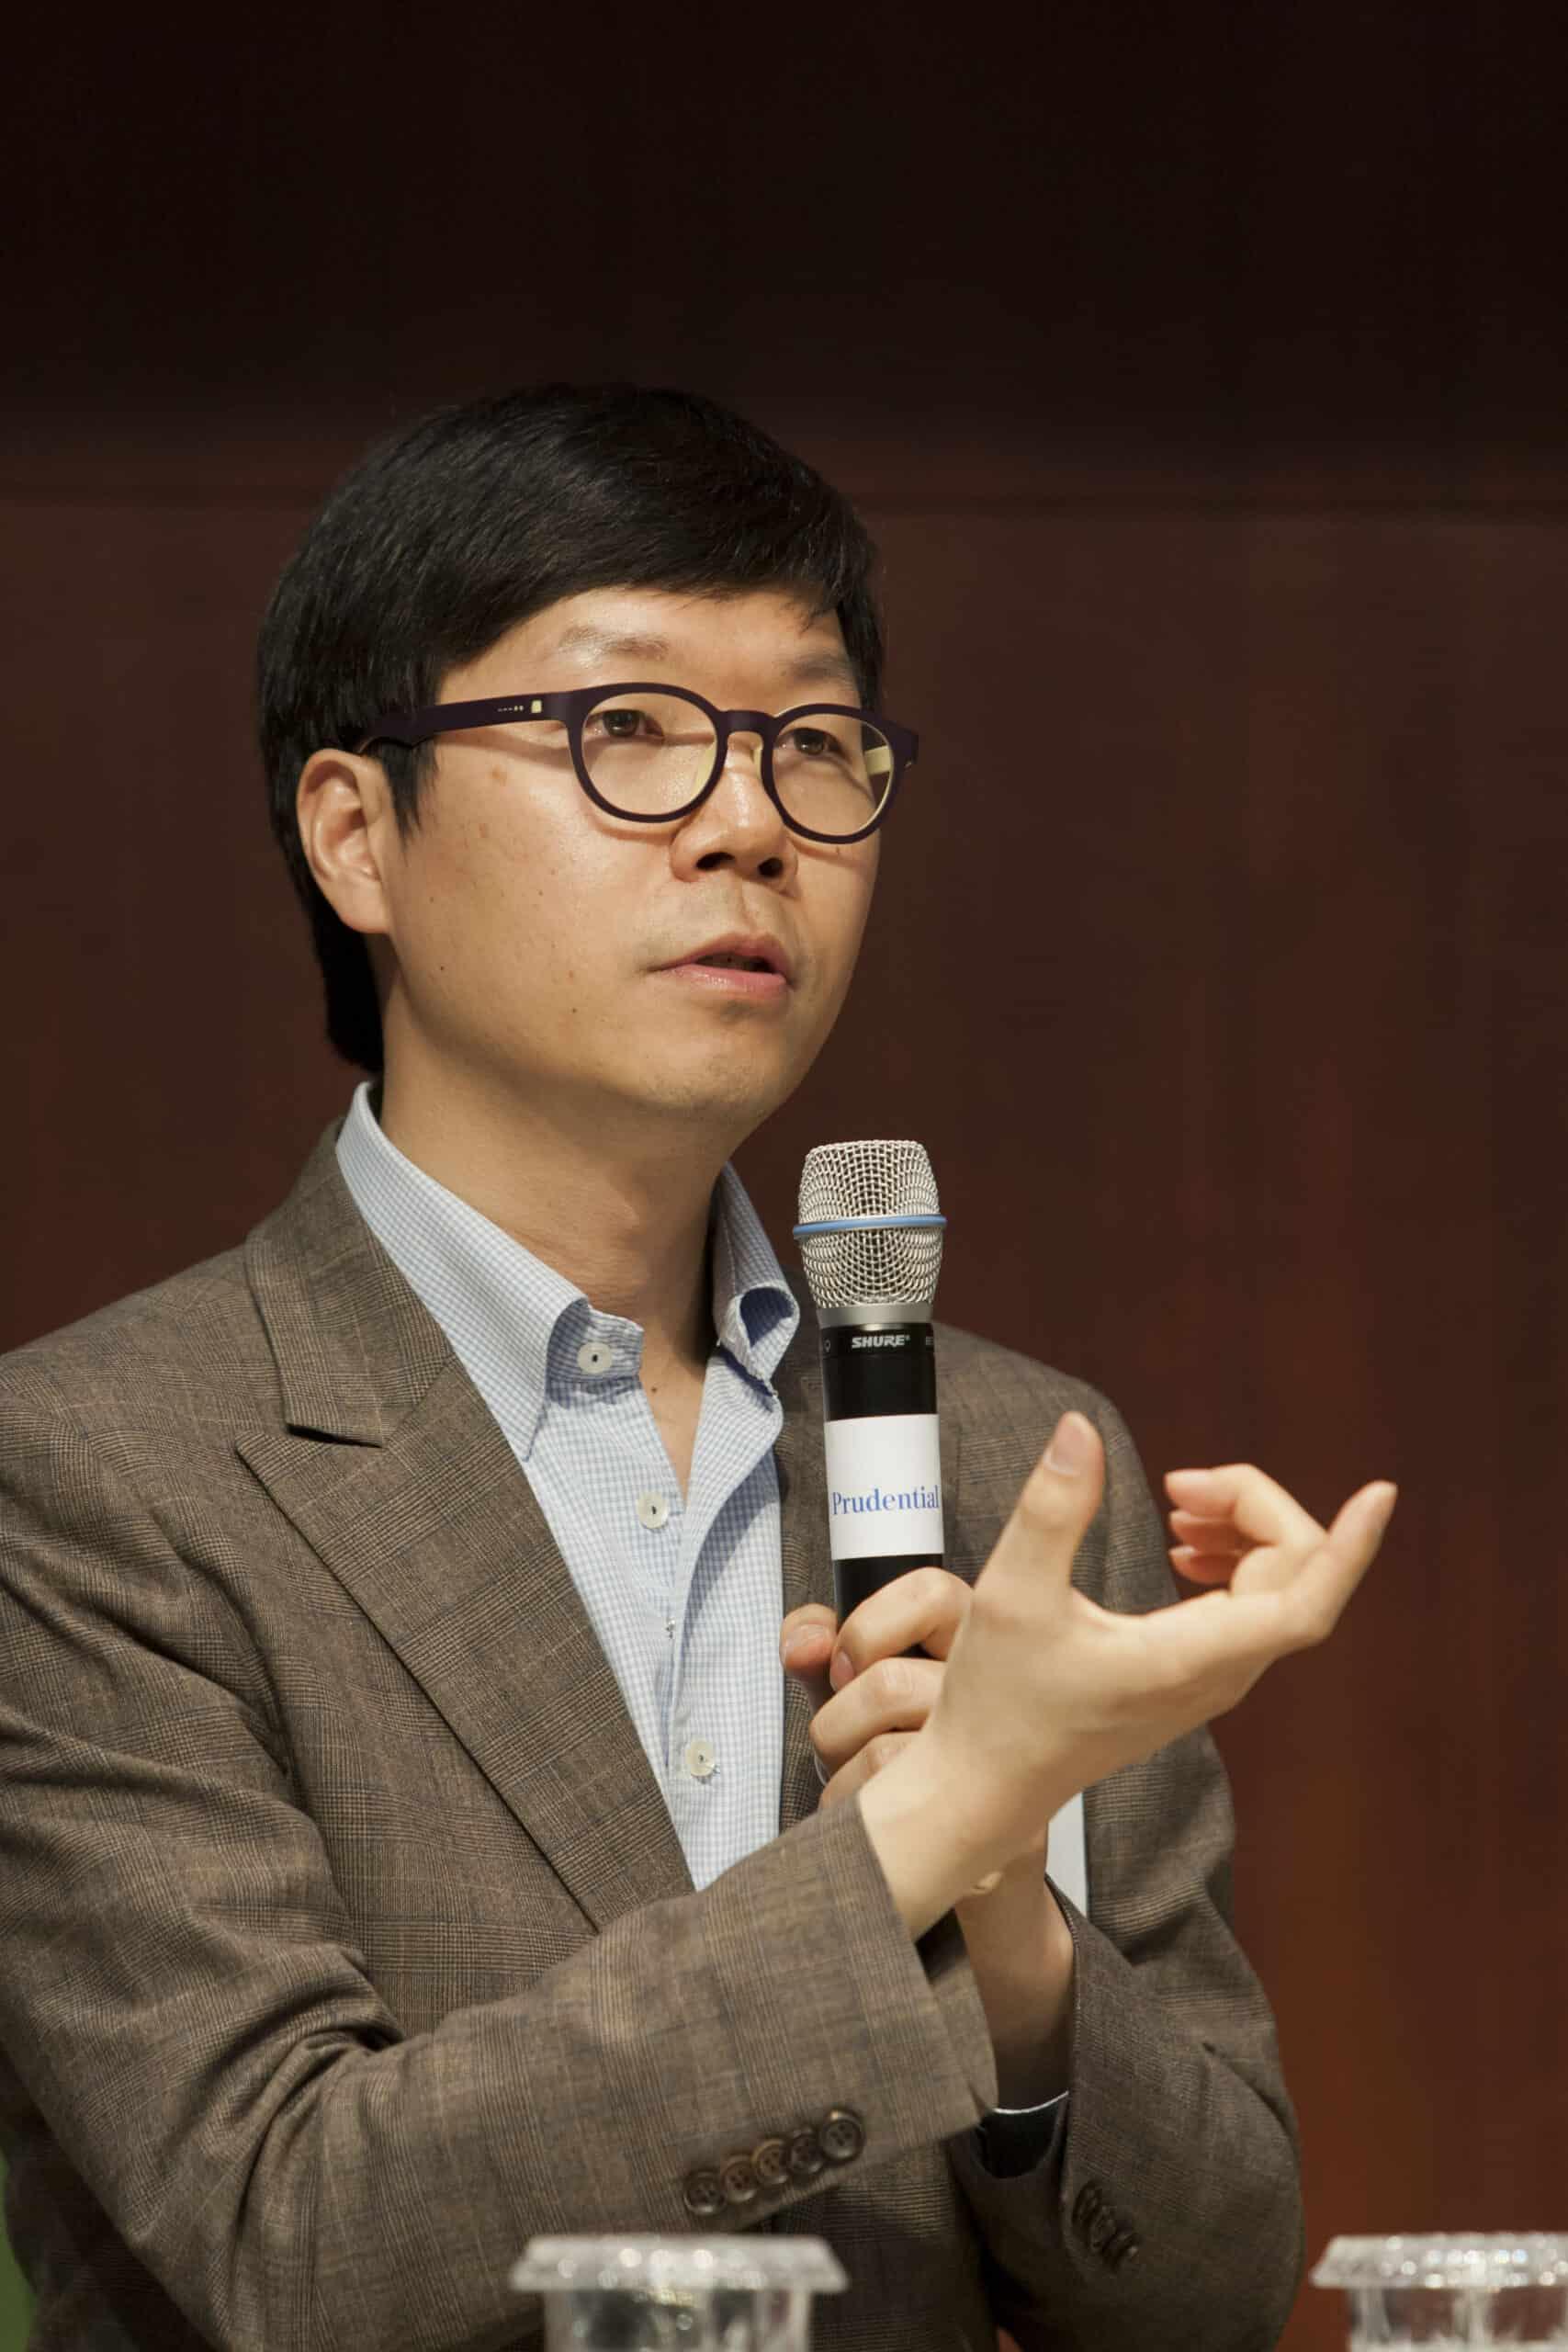 Jeongtae Kim